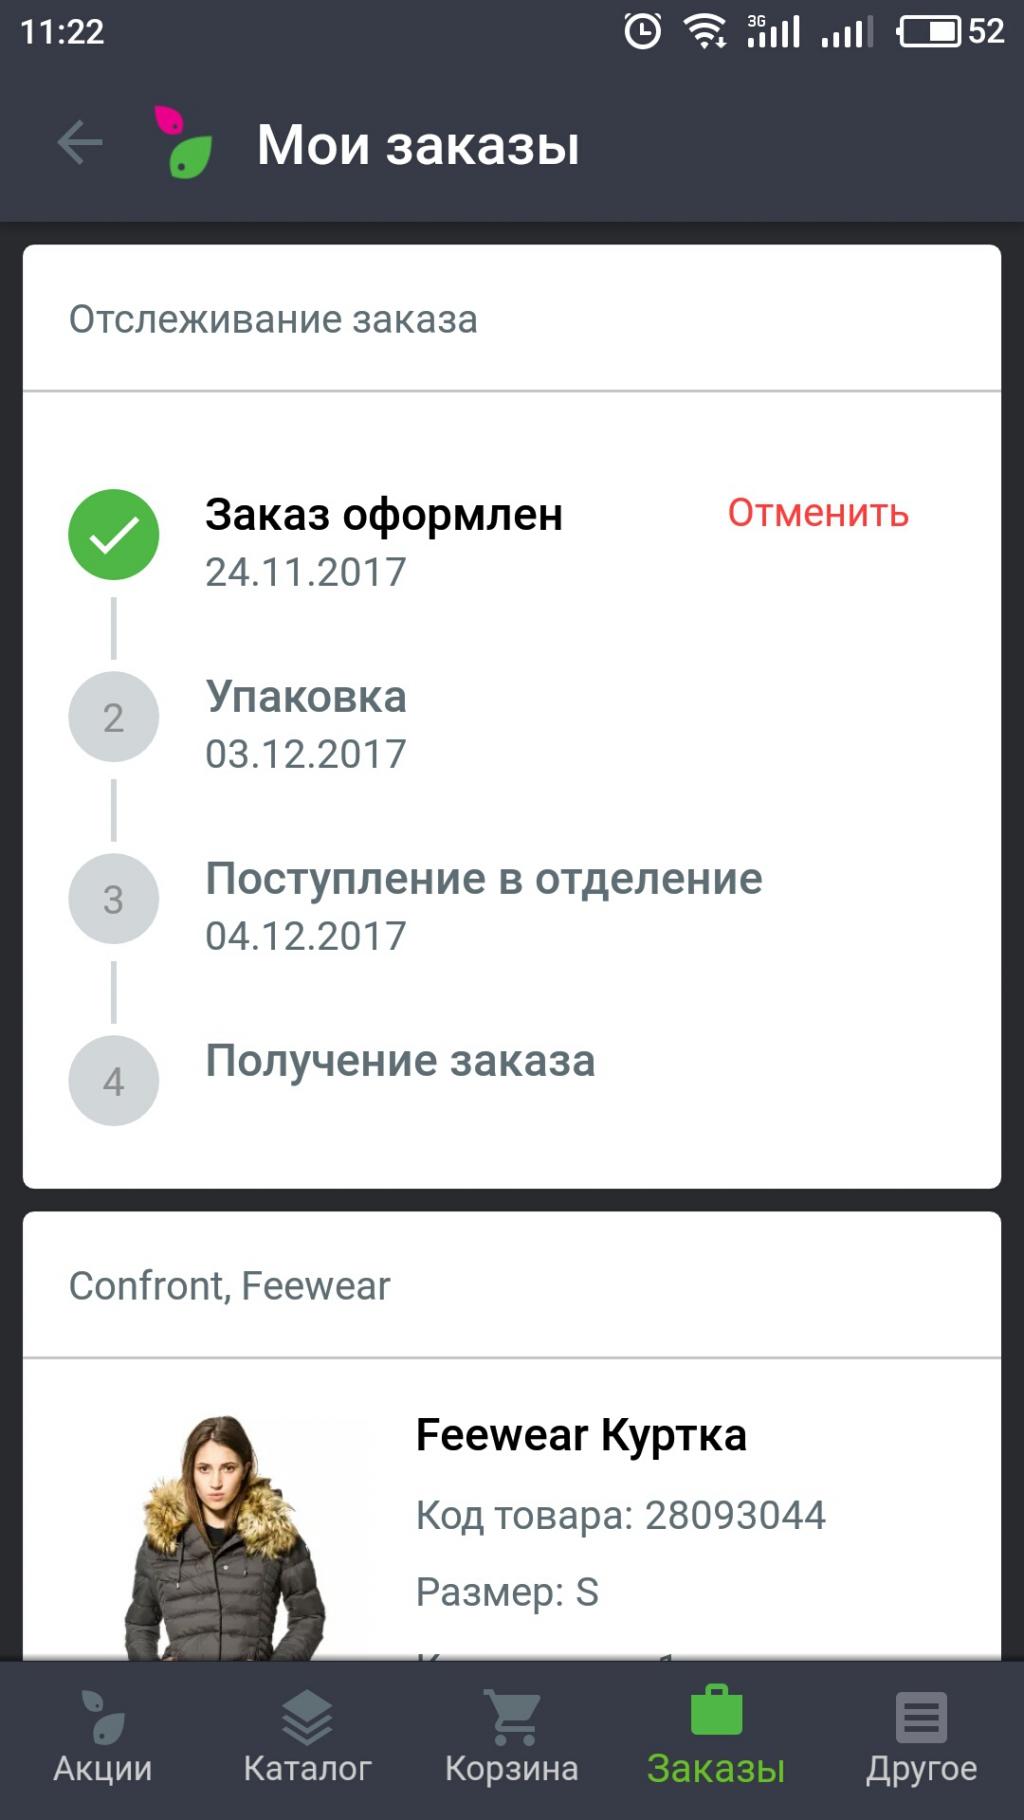 modnaKasta - Не доставляют товар